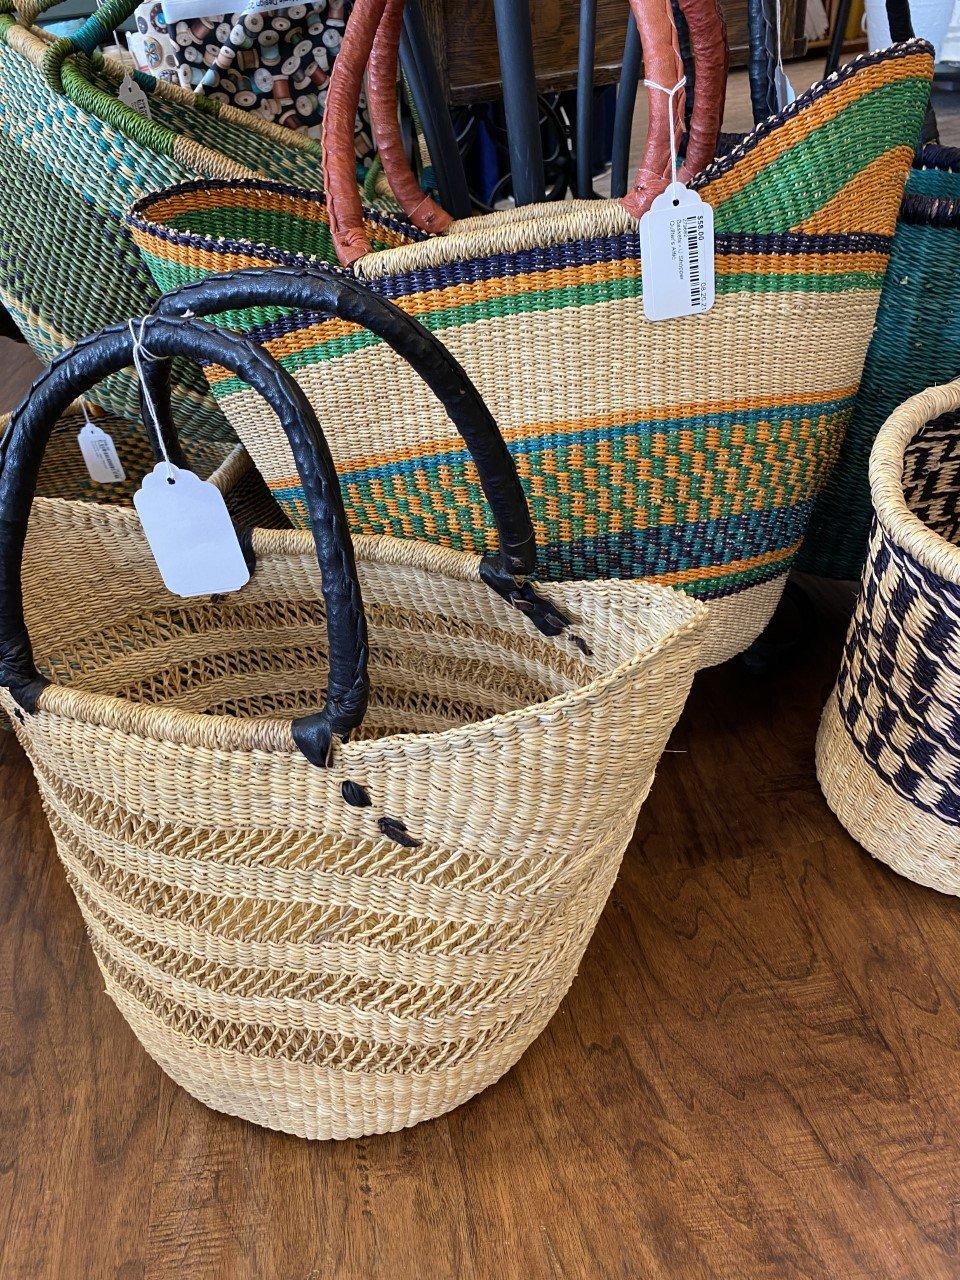 Baskets - U Shopper